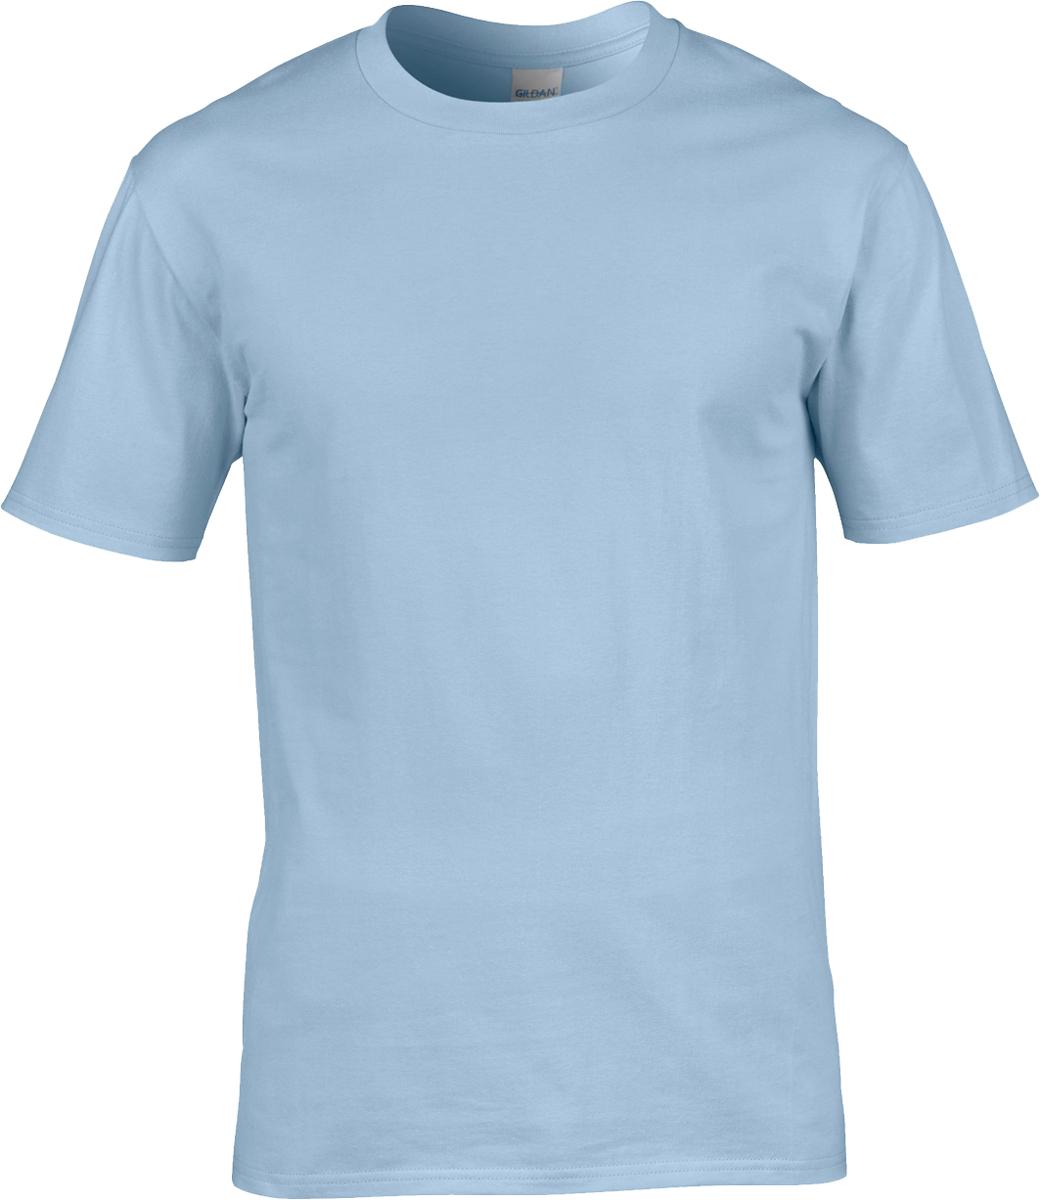 Gildan Men Adults Casual Wear T-Shirt Double Needle Collar Premium Ringspun Tee